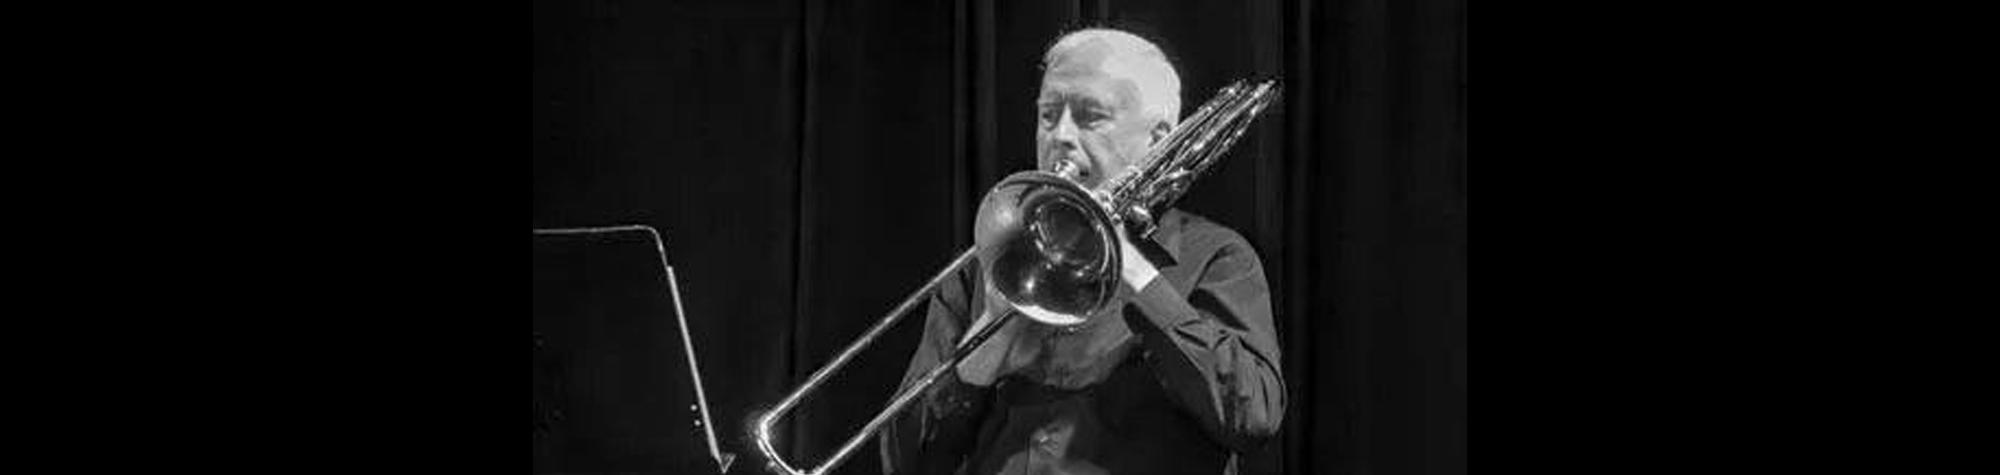 Ralph Sauer Trombone Interview – Trombone Corner #5